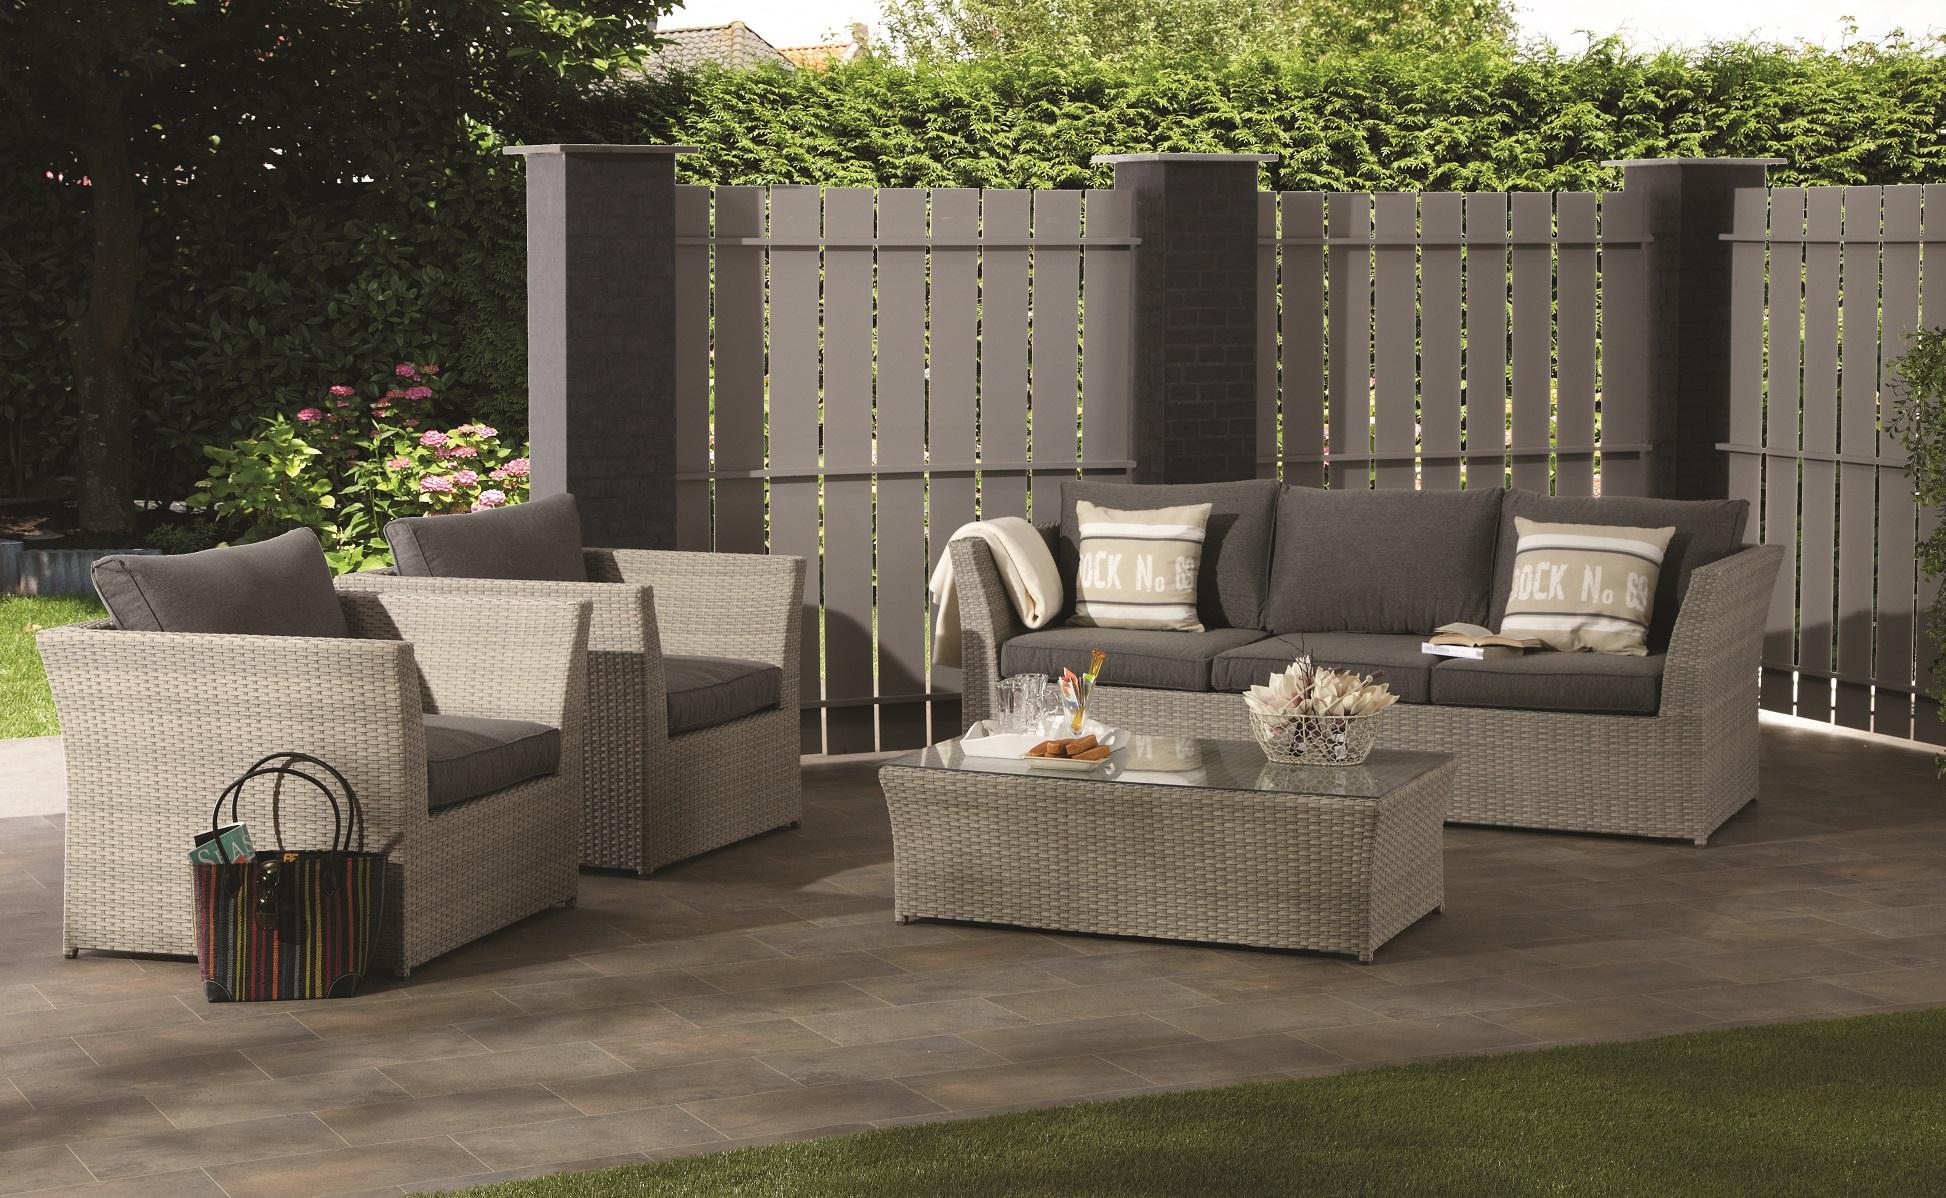 tunis xxl polyrattan lounge gartenm bel sitzgruppe grau braun lounge m bel garten. Black Bedroom Furniture Sets. Home Design Ideas